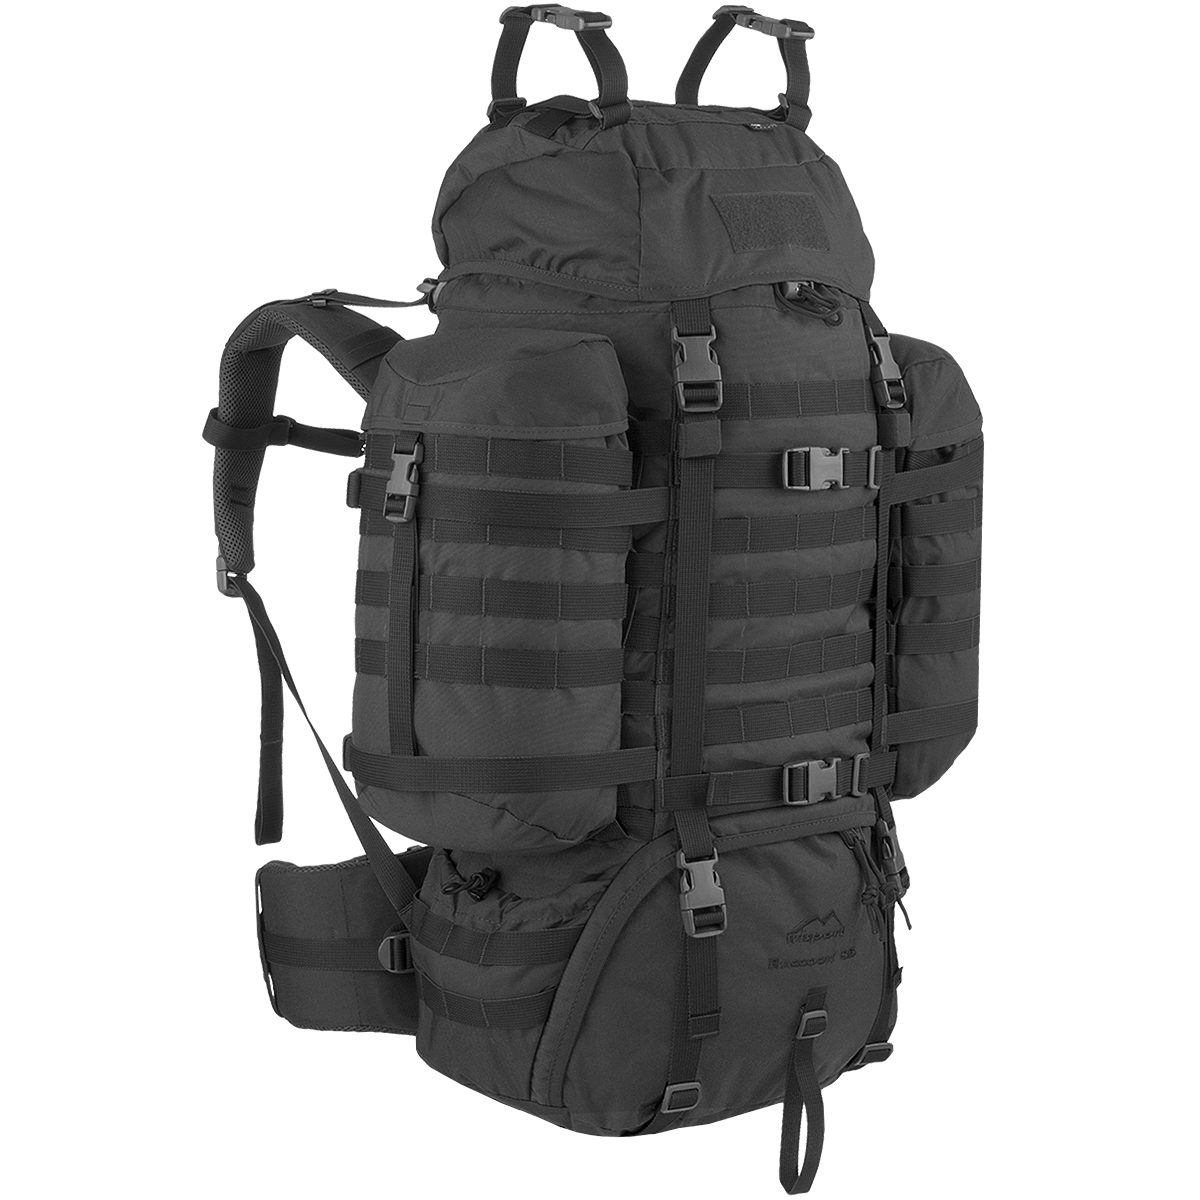 comprar popular b8e9d 2a9f3 Detalles de Wisport Mapache Militar Mochila Asalto Mochila Molle Trekking  Pack 85L Negro